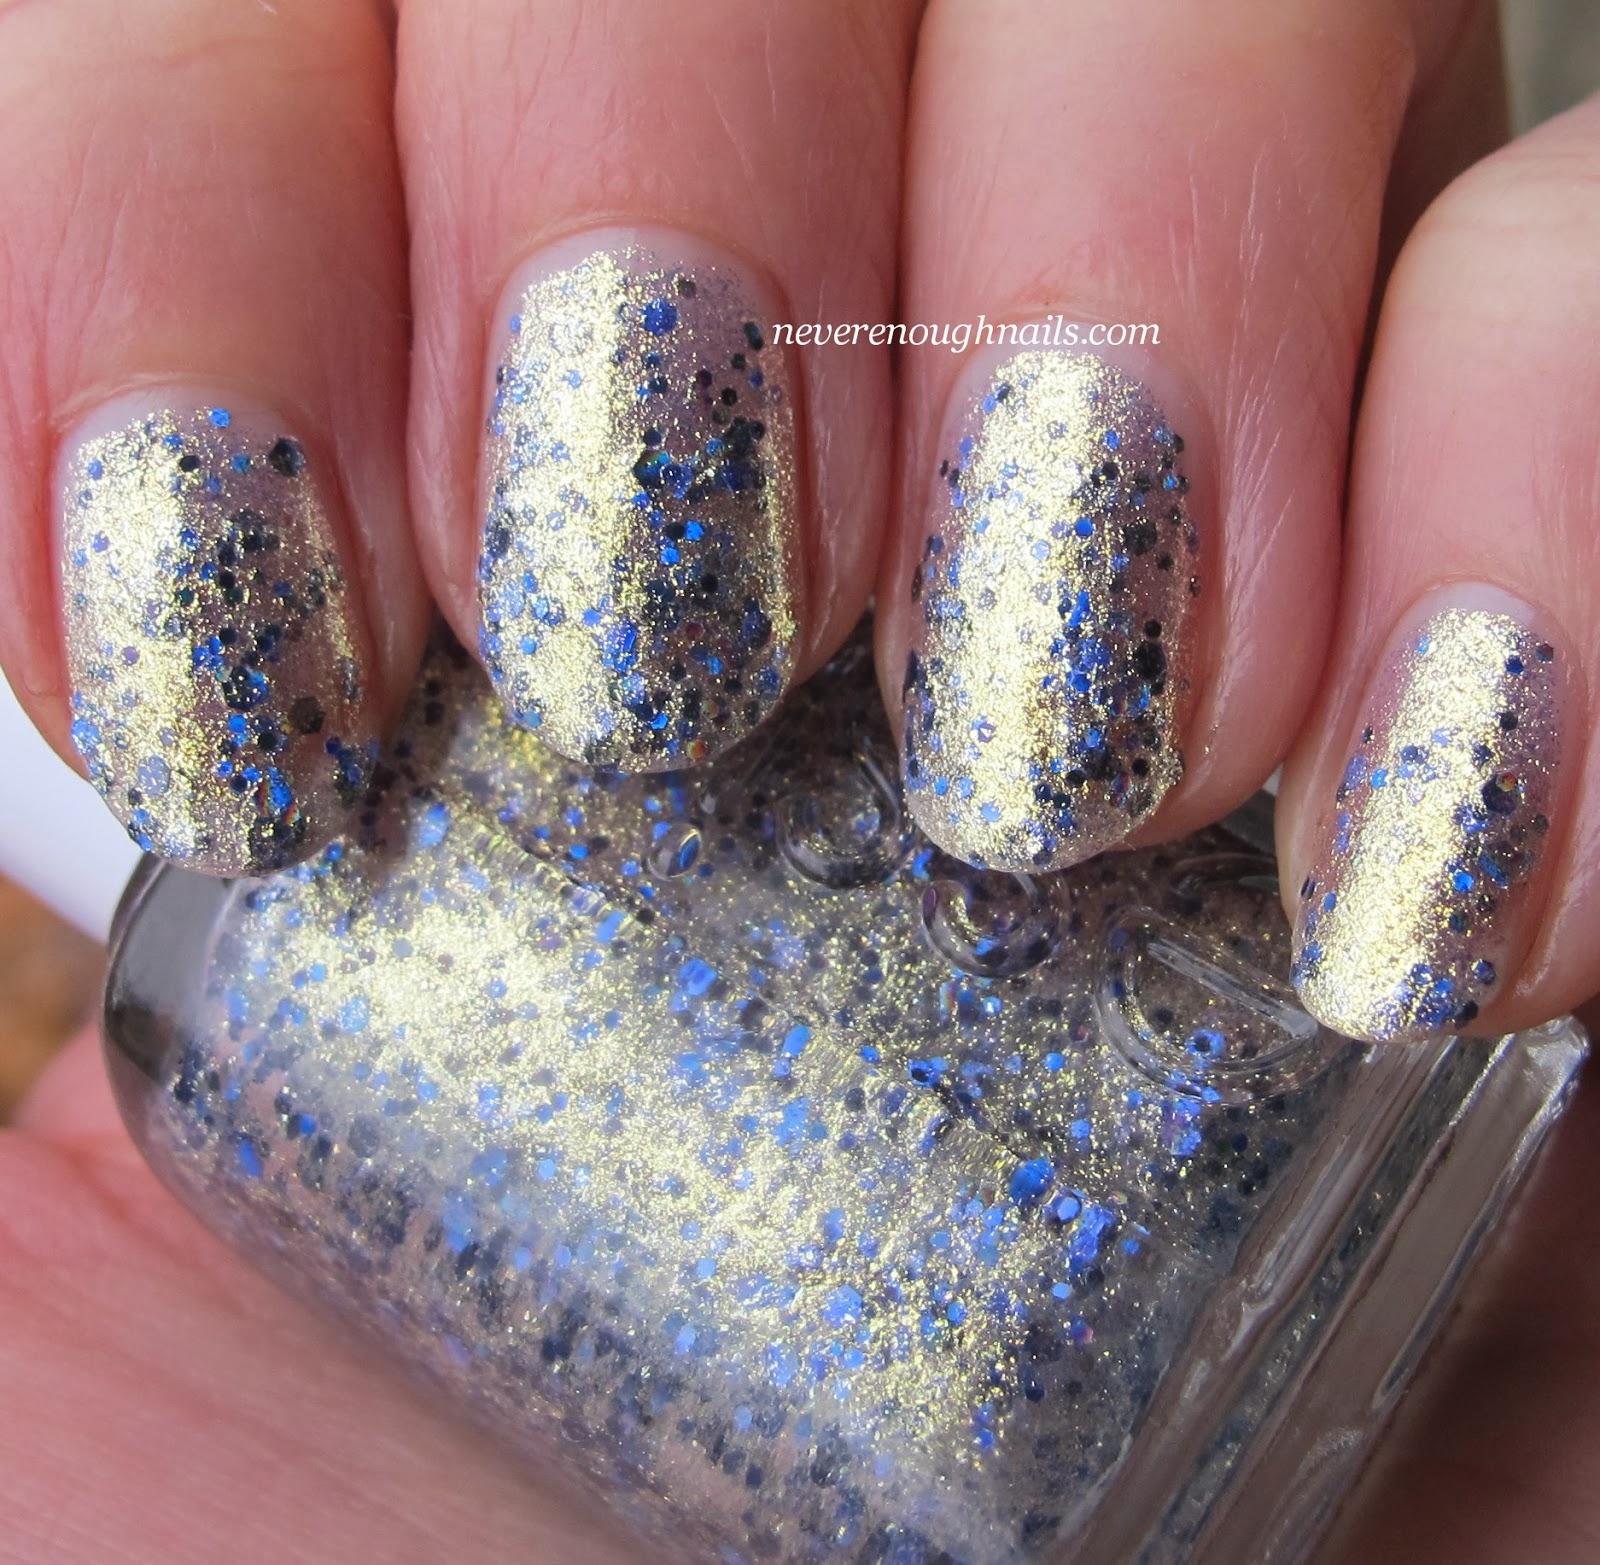 Essie Chunky Glitter Nail Polish | Hession Hairdressing